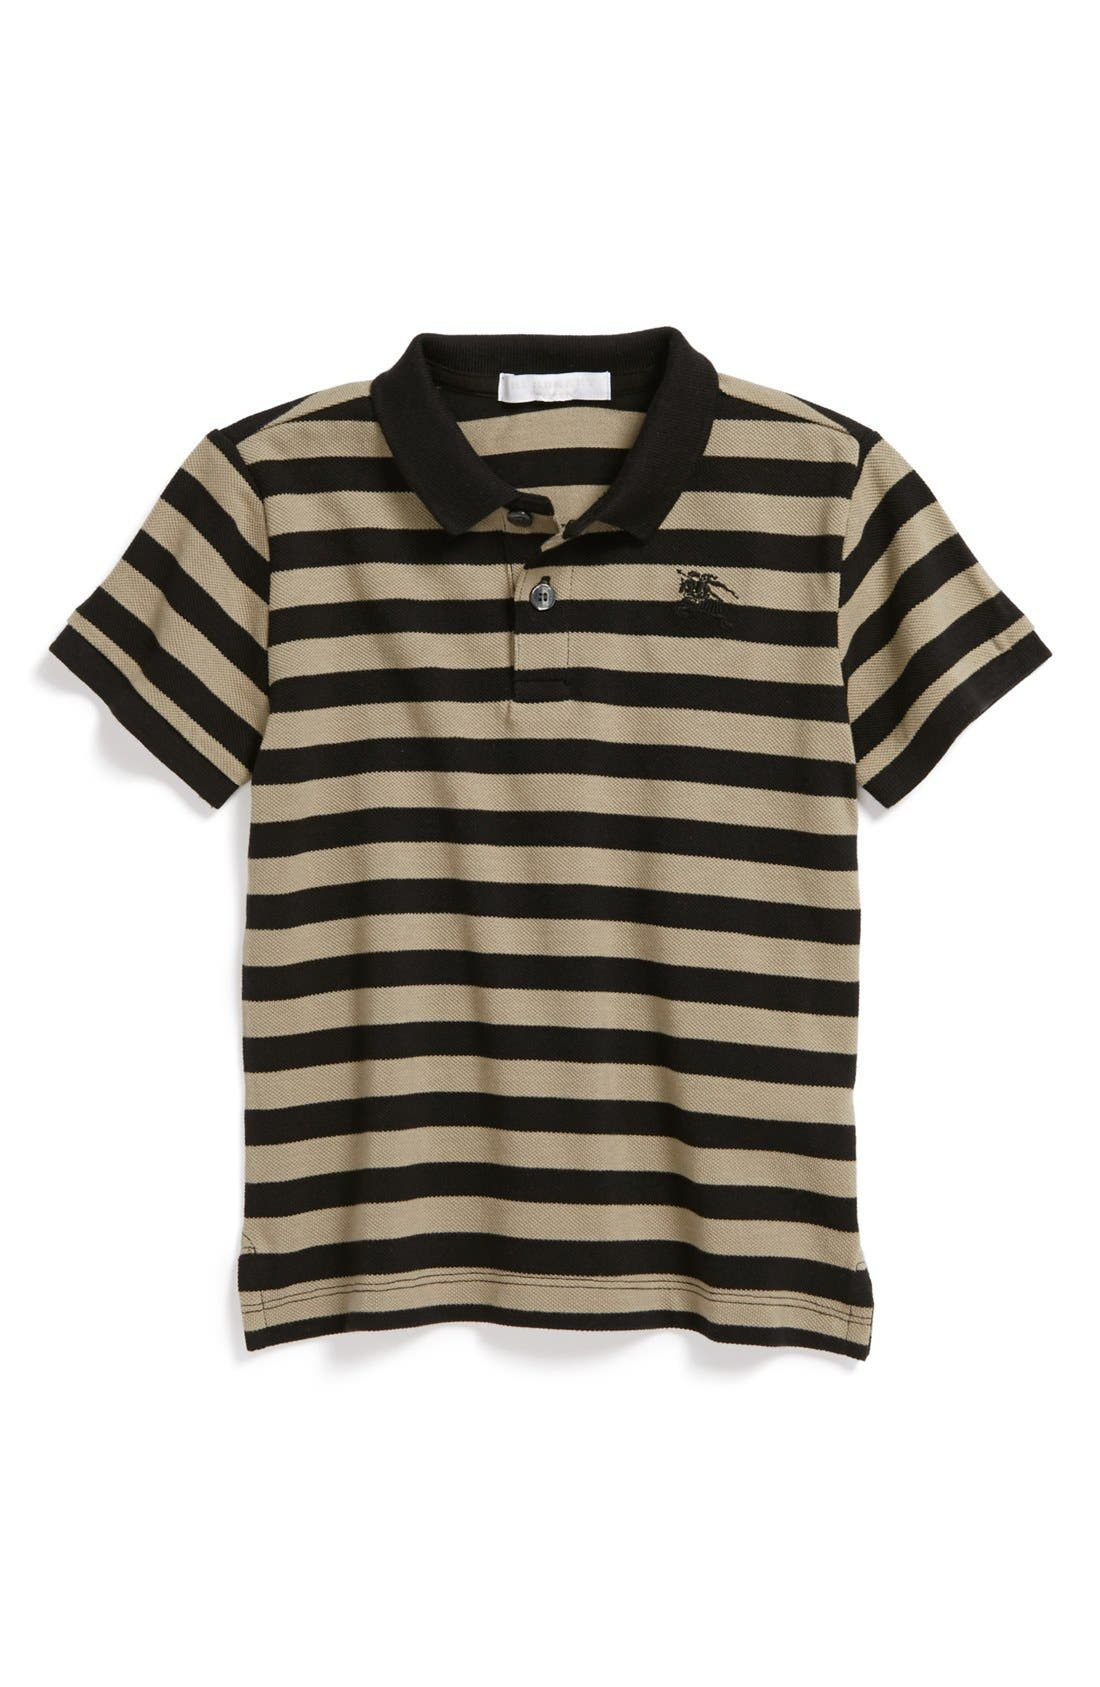 Alternate Image 1 Selected - Burberry 'Hemel' Stripe Polo (Toddler Boys, Little Boys & Big Boys)